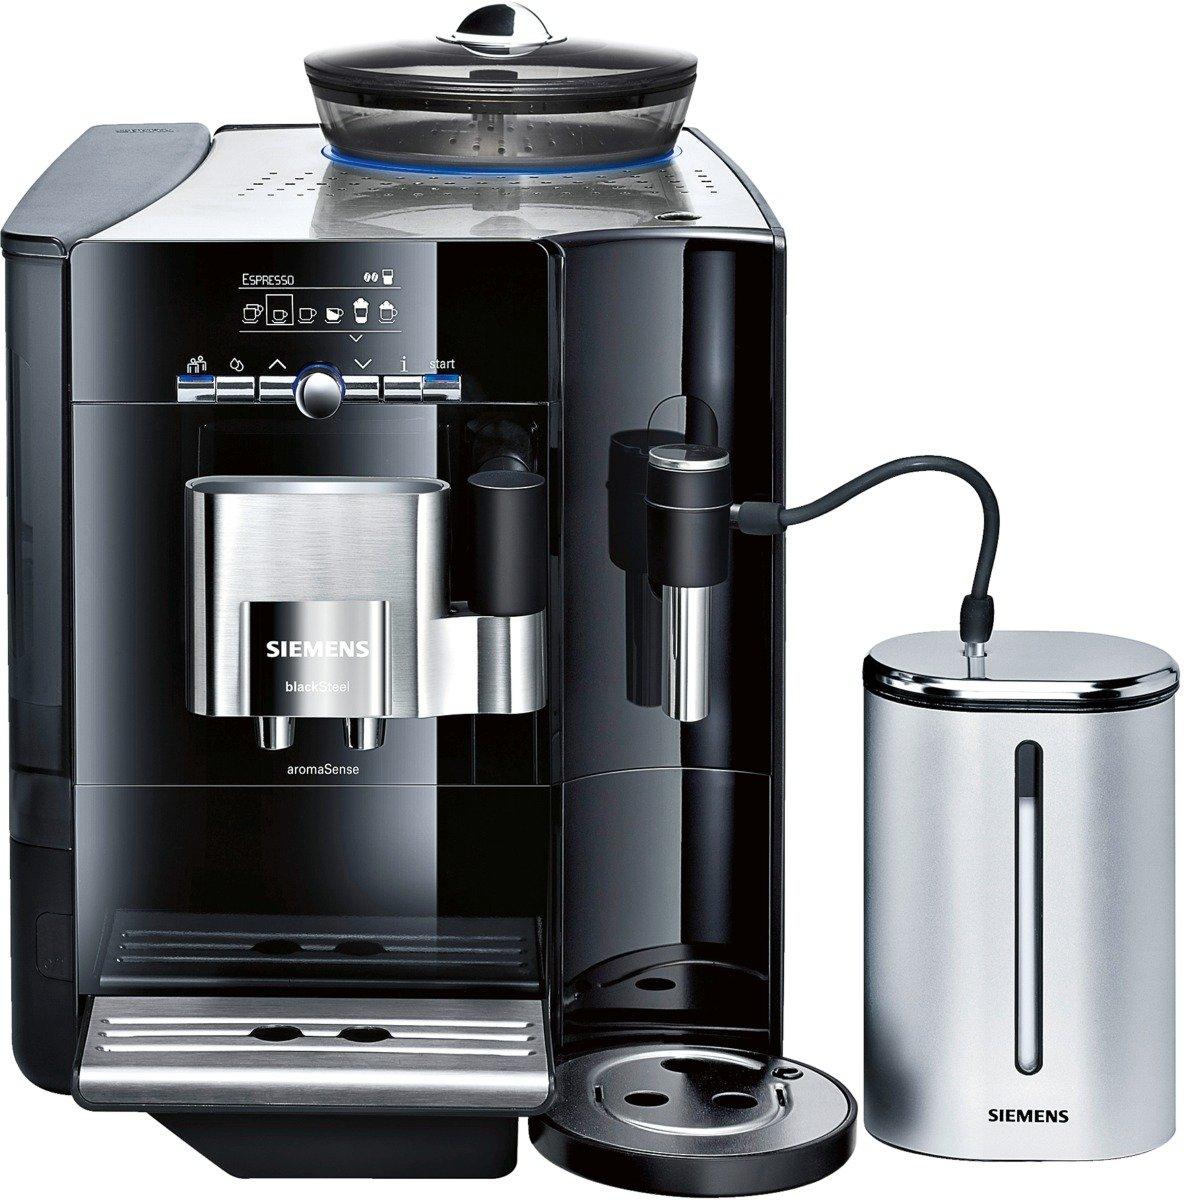 Siemens TE716519DE EQ.7 Plus Aroma Sense Kaffeevollautomat (Milchsystem)